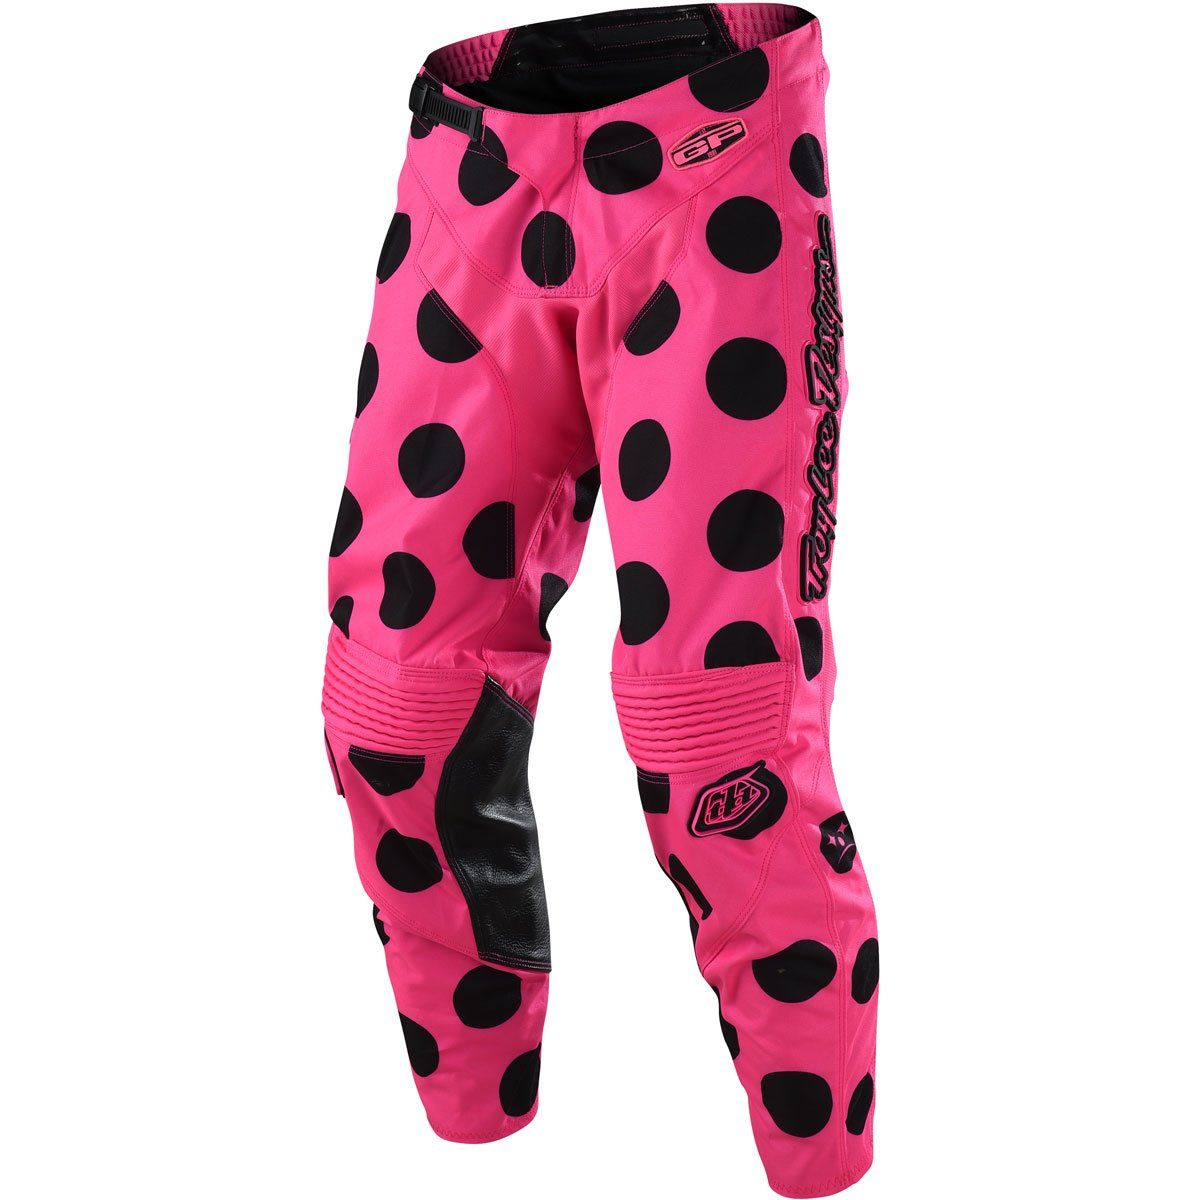 2018 Troy Lee Designs GP Polka Dot Pants-Black/Flo Pink-30